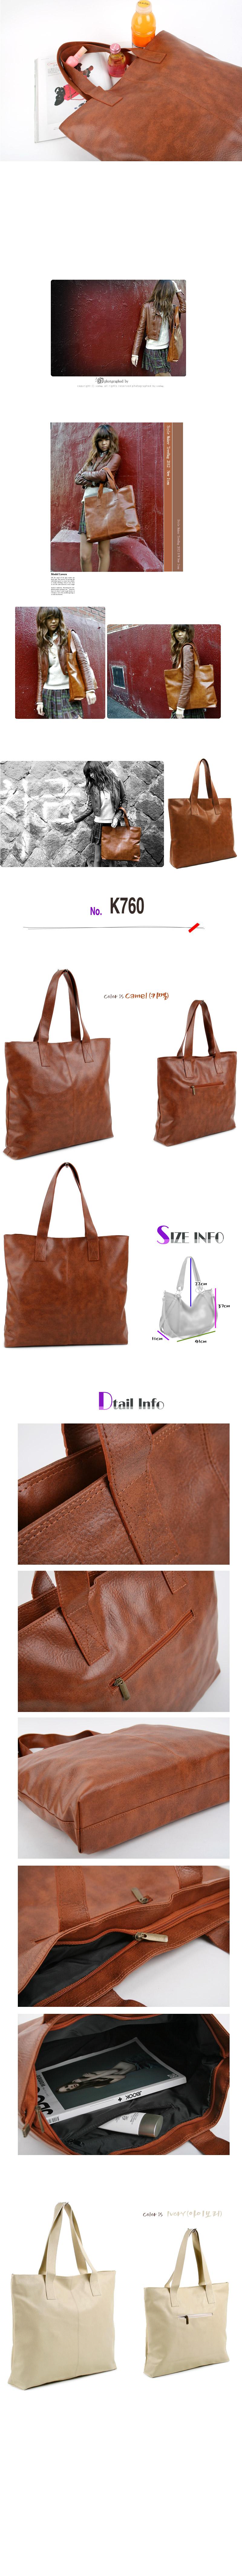 handbag no.K760view